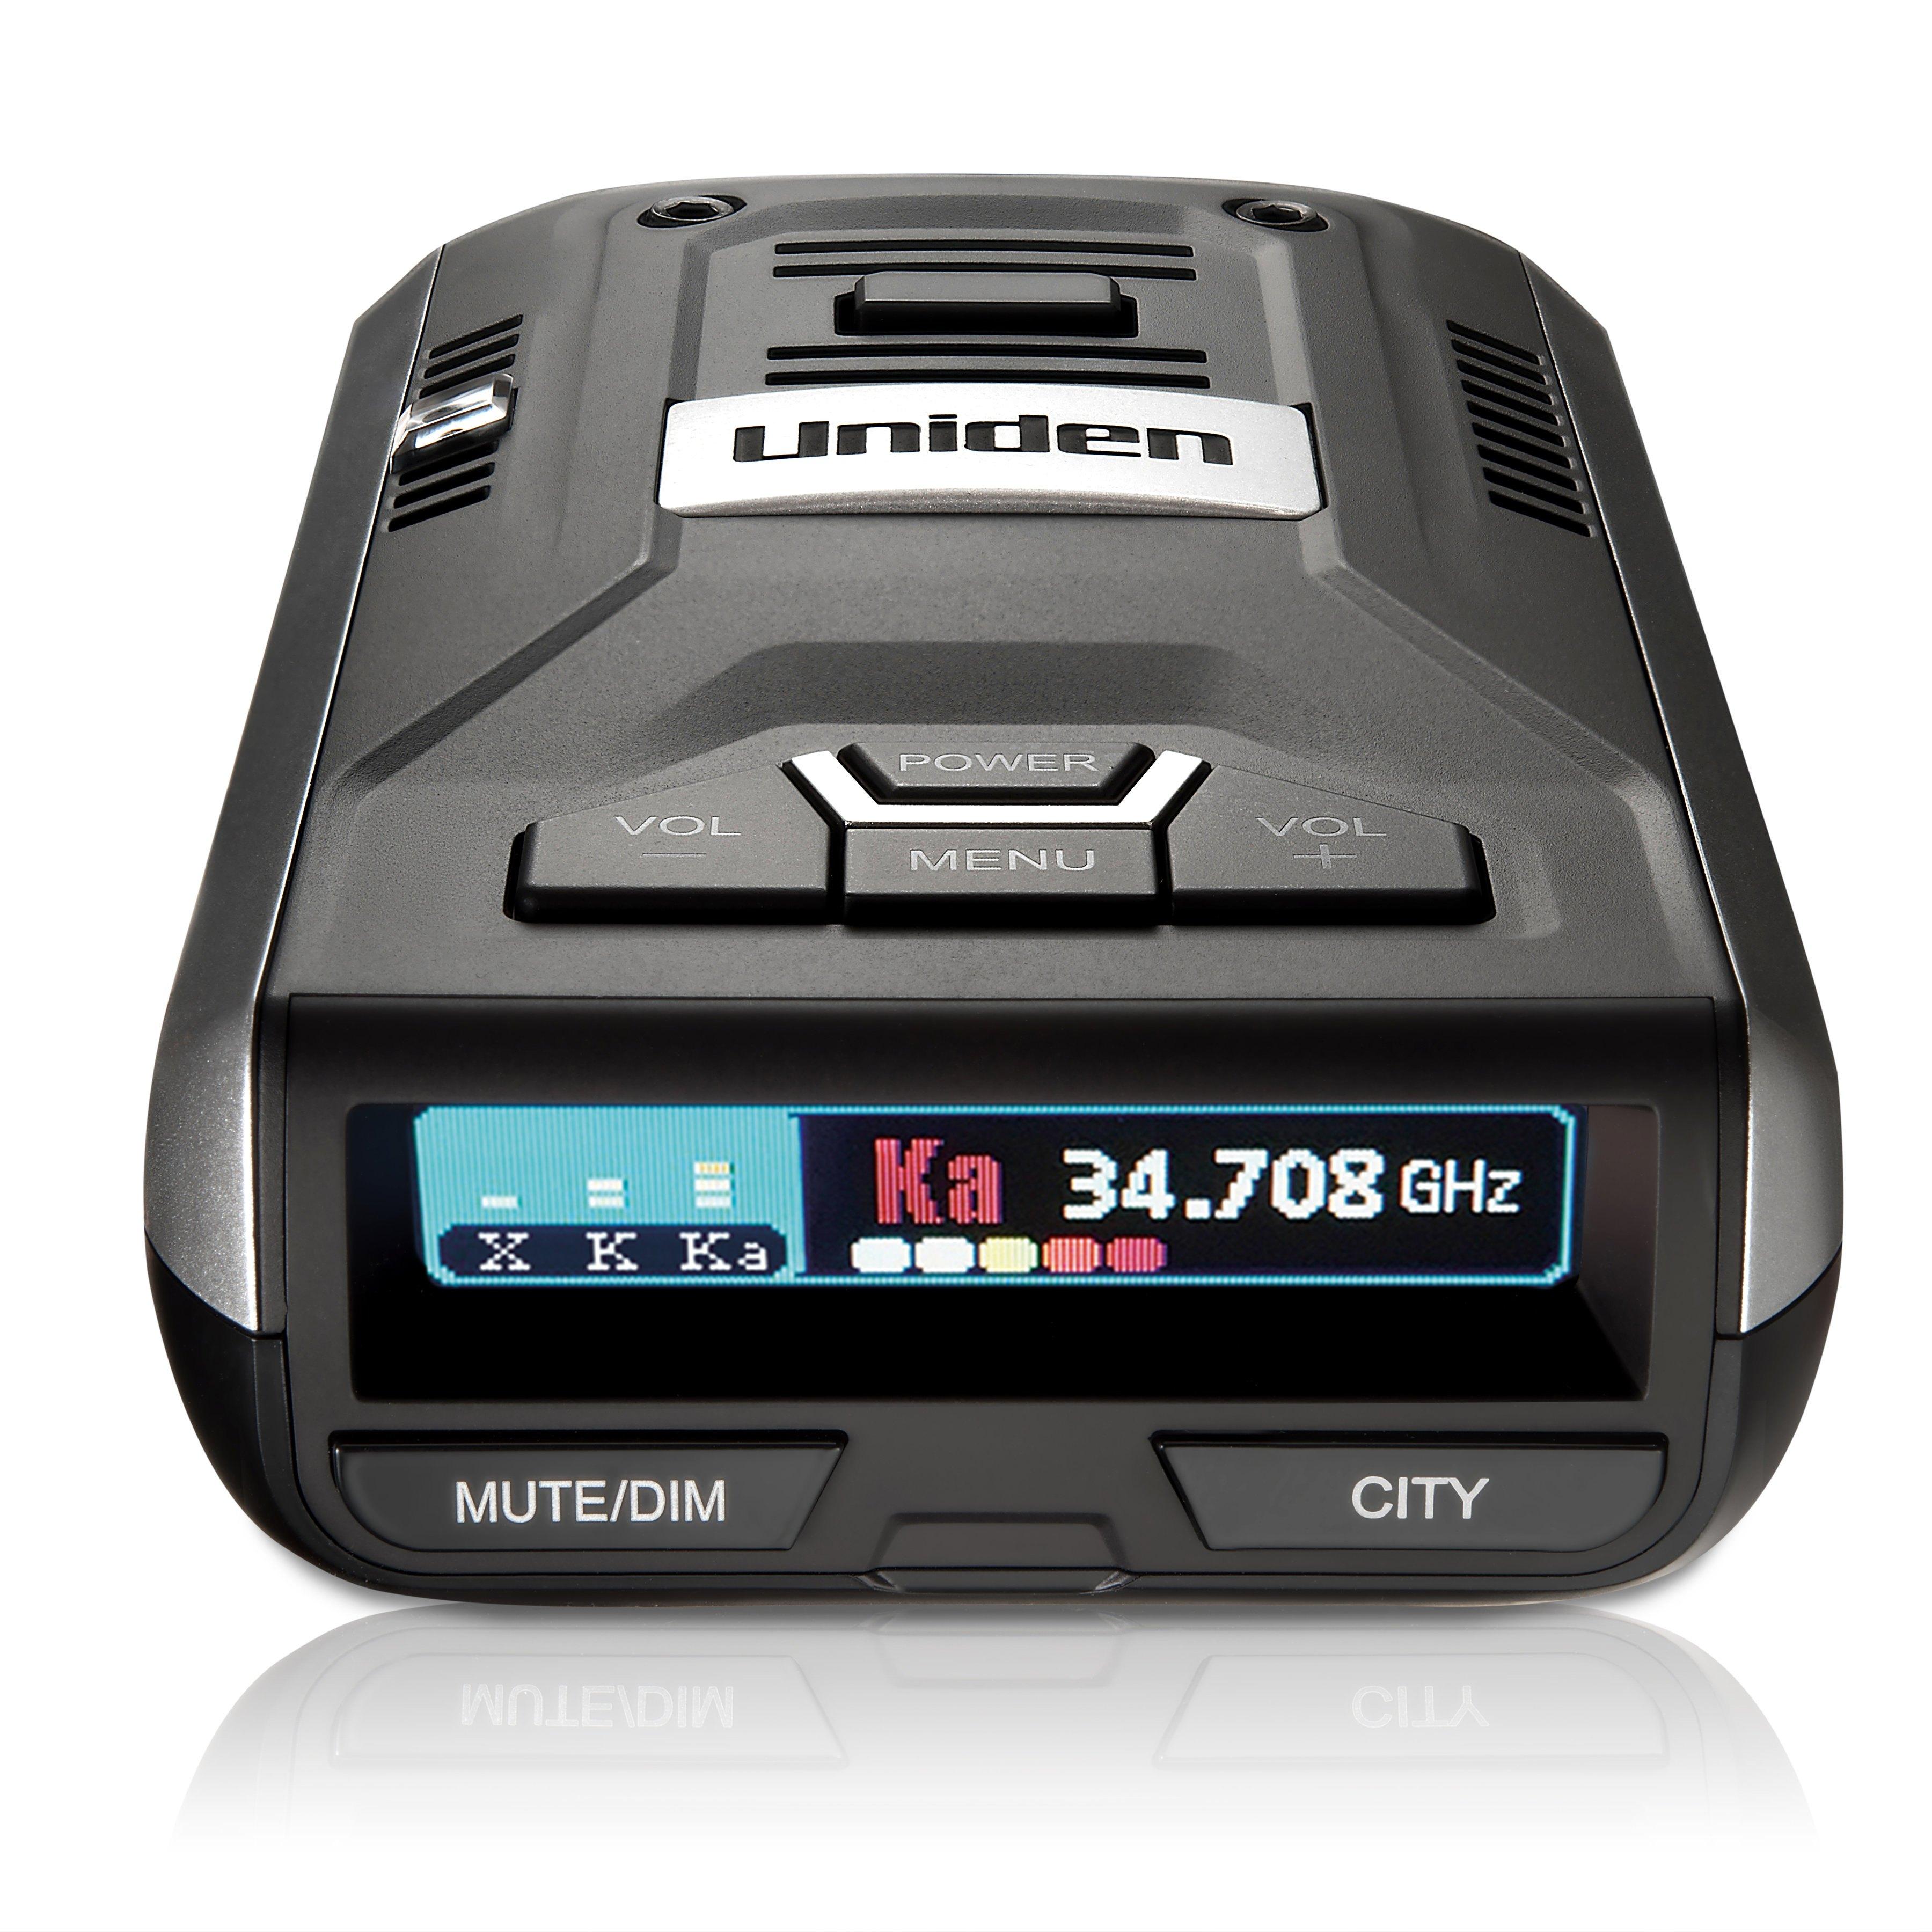 Uniden Extreme Long Range Laser Radar Detector: R3 $340, R1 $255 + Free Shipping